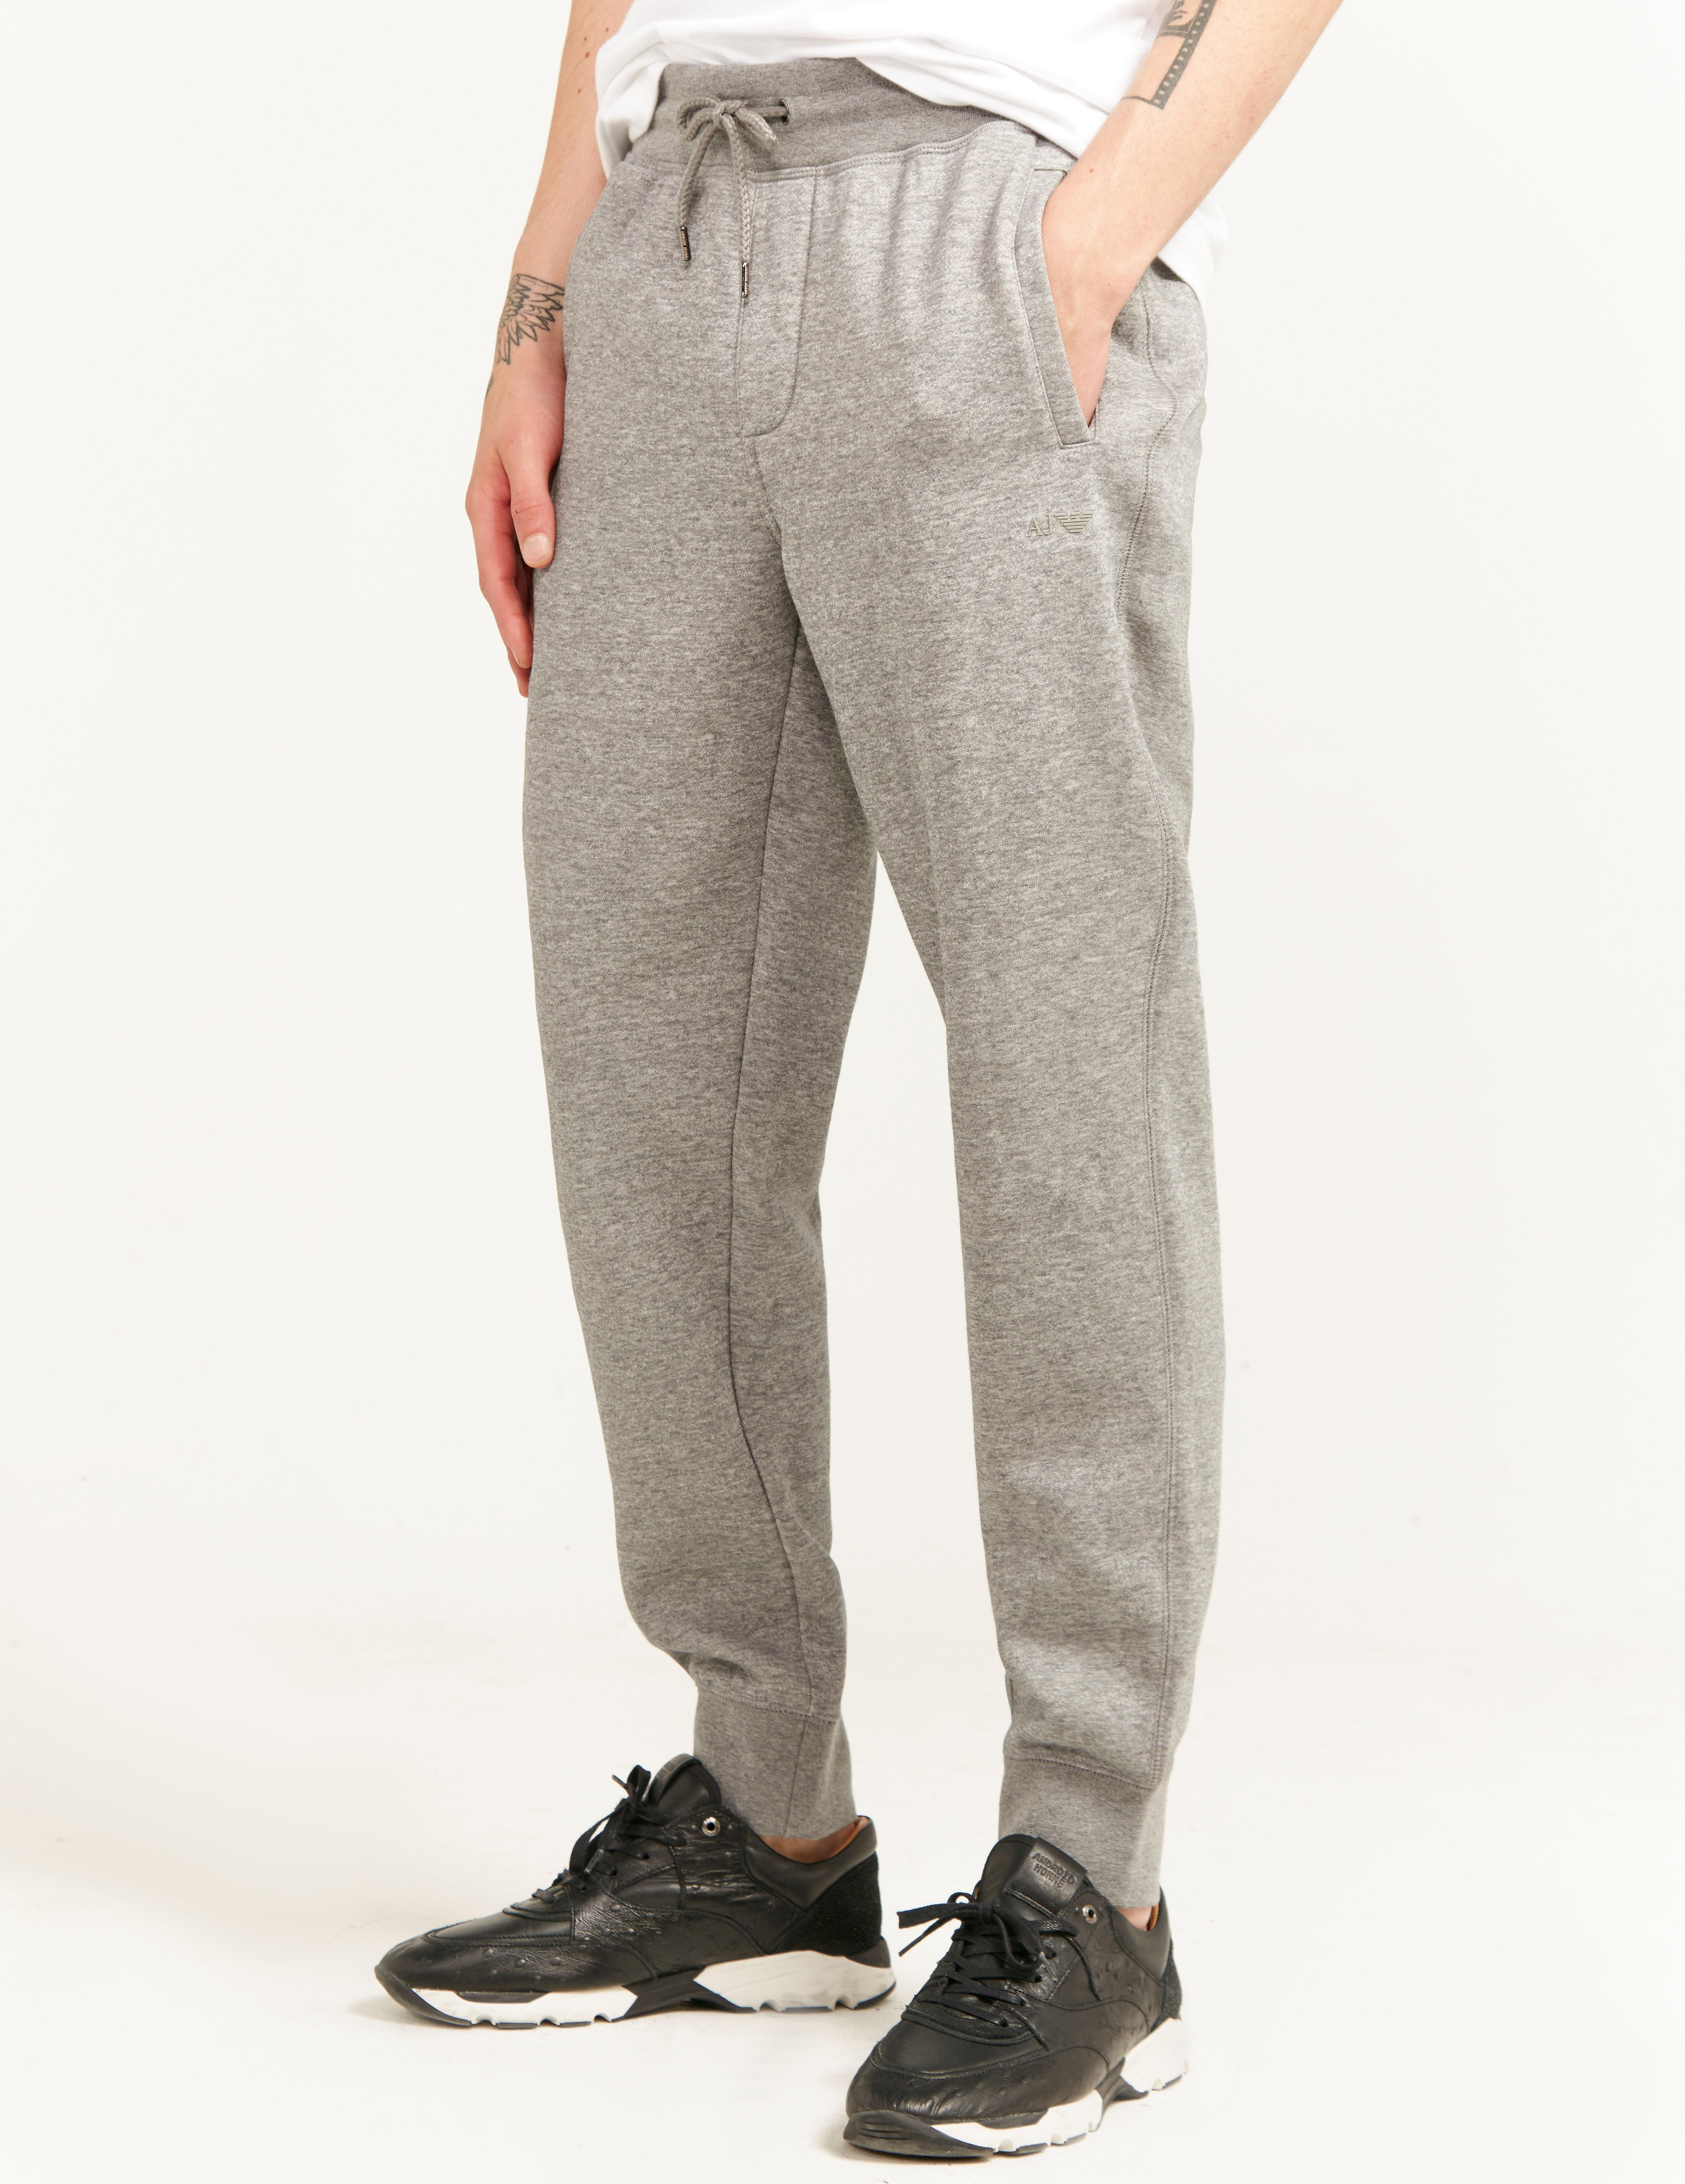 Armani Jeans Cuffed Track Pants